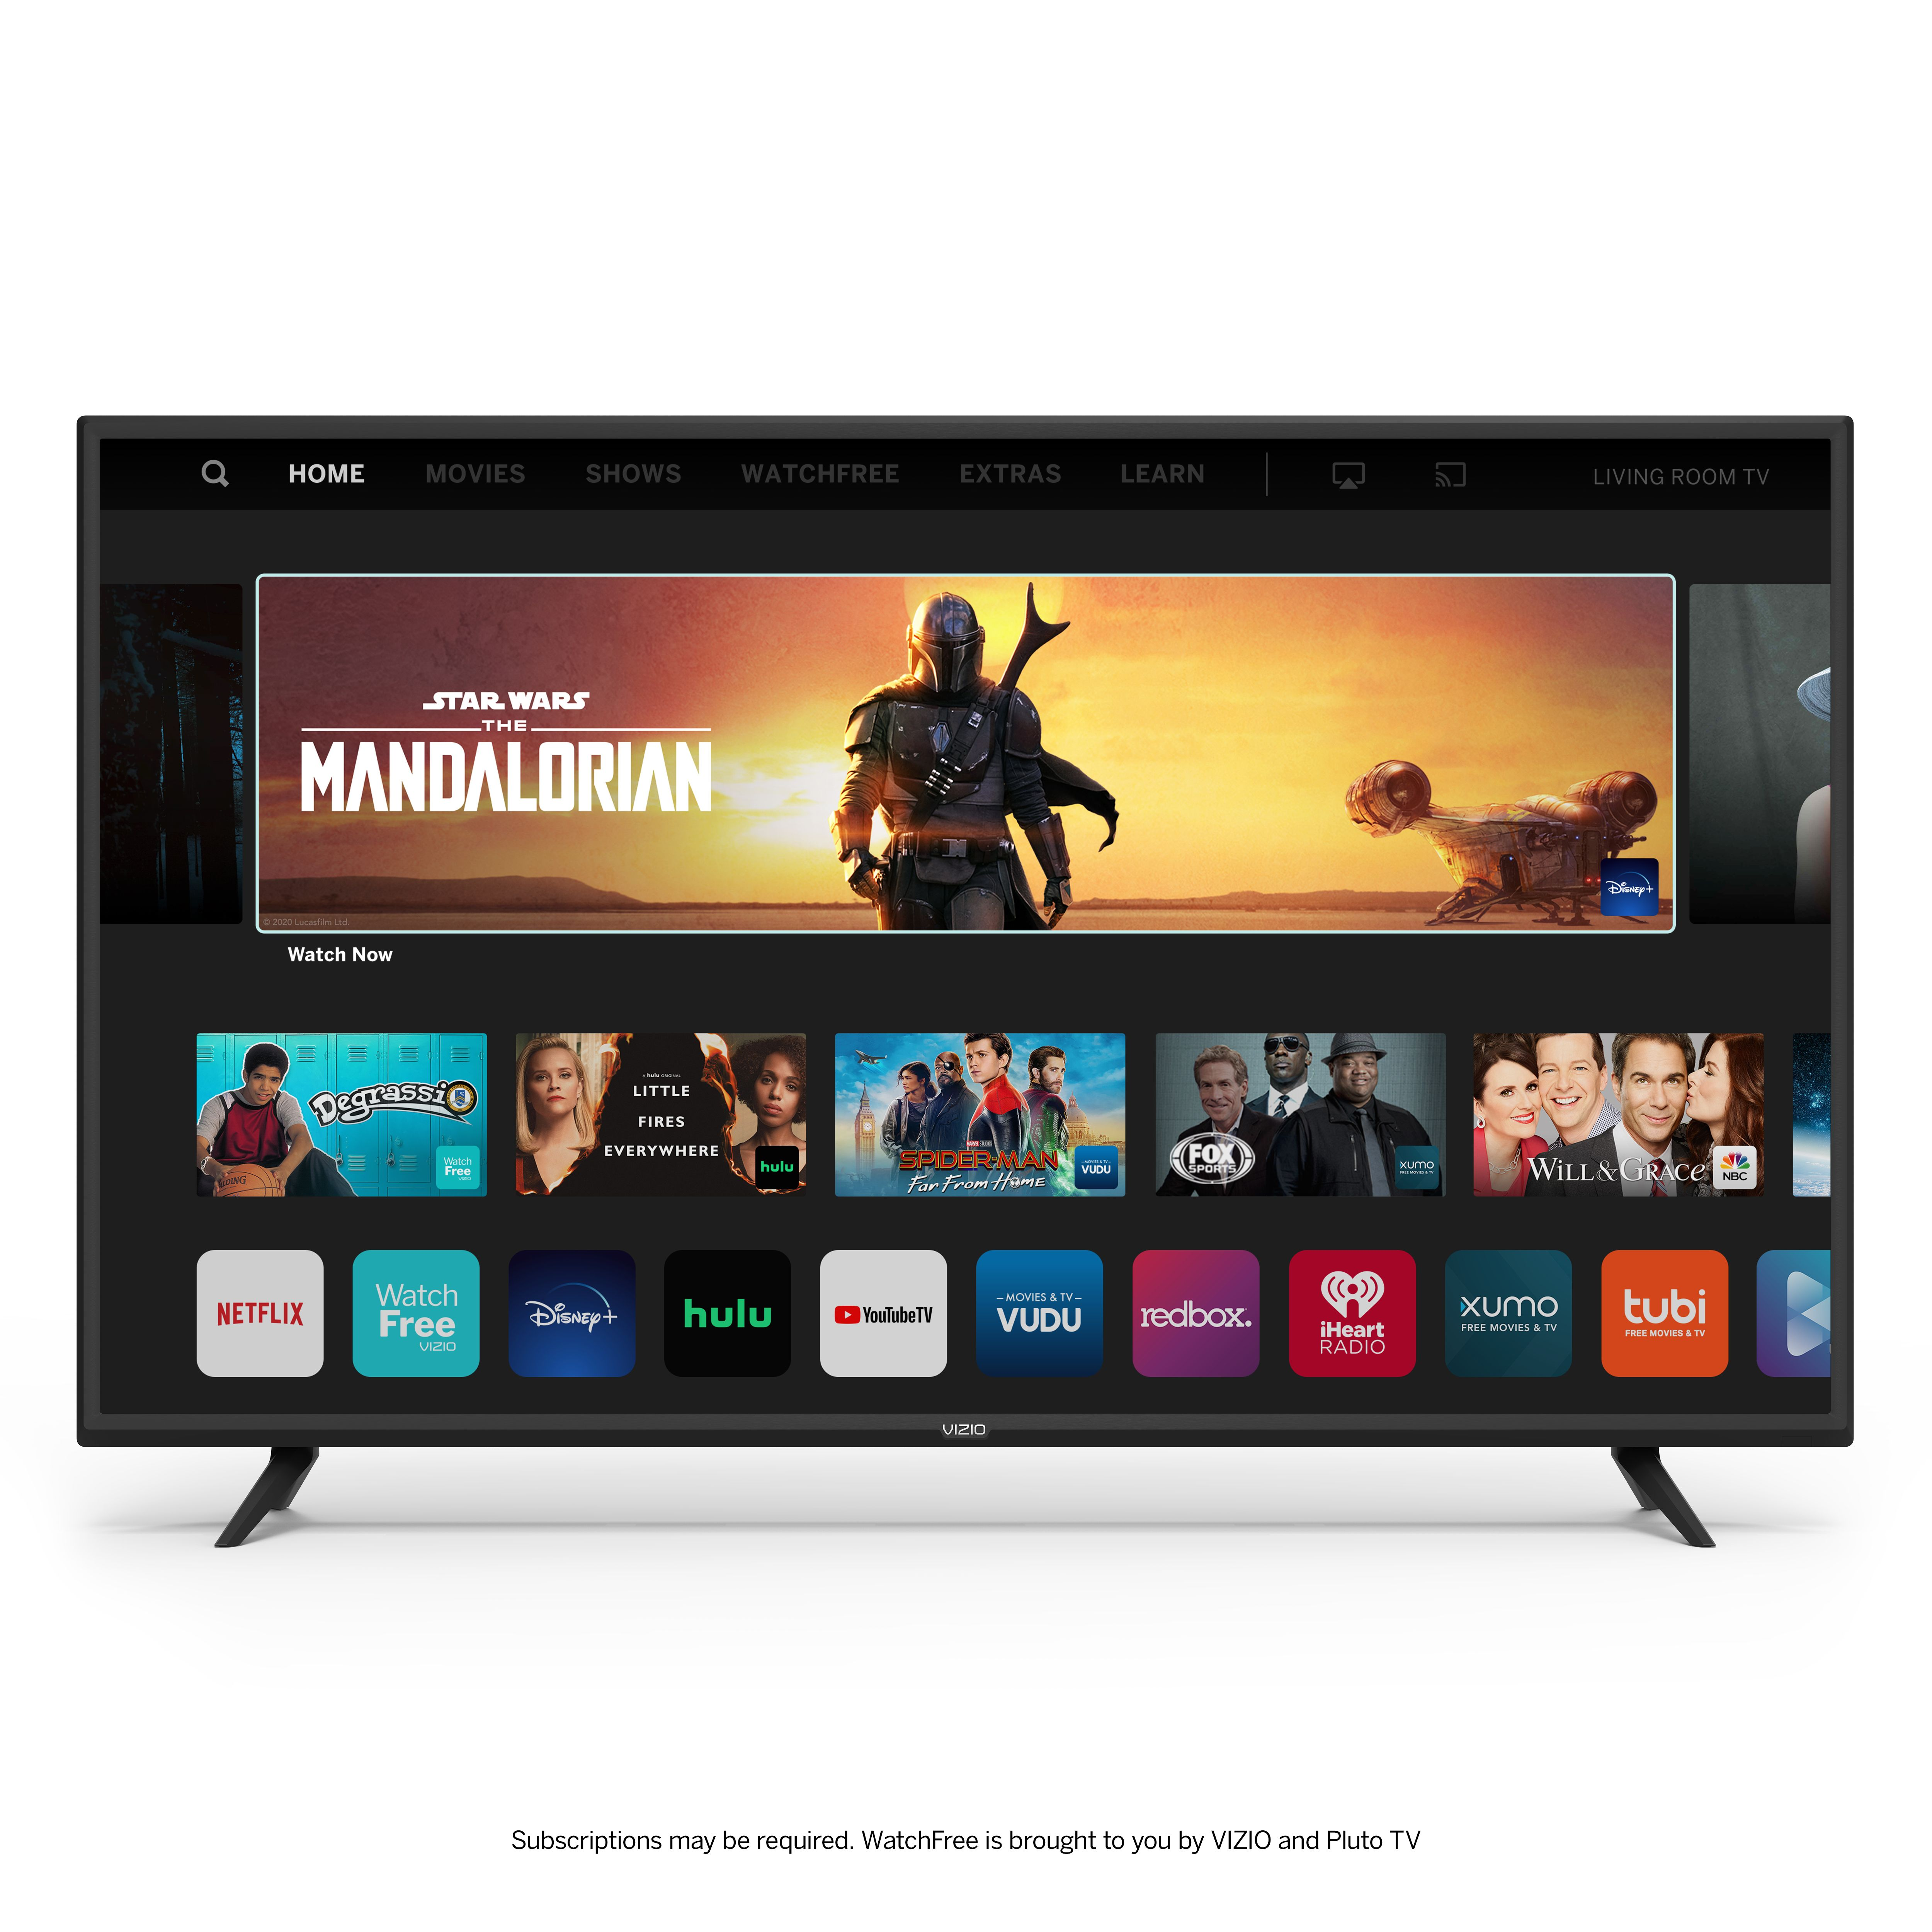 Vizio 50 Class 4k Uhd Led Smartcast Smart Tv V Series V505 G H Walmart Com In 2021 Smart Tv Vizio Alexa Enabled Devices